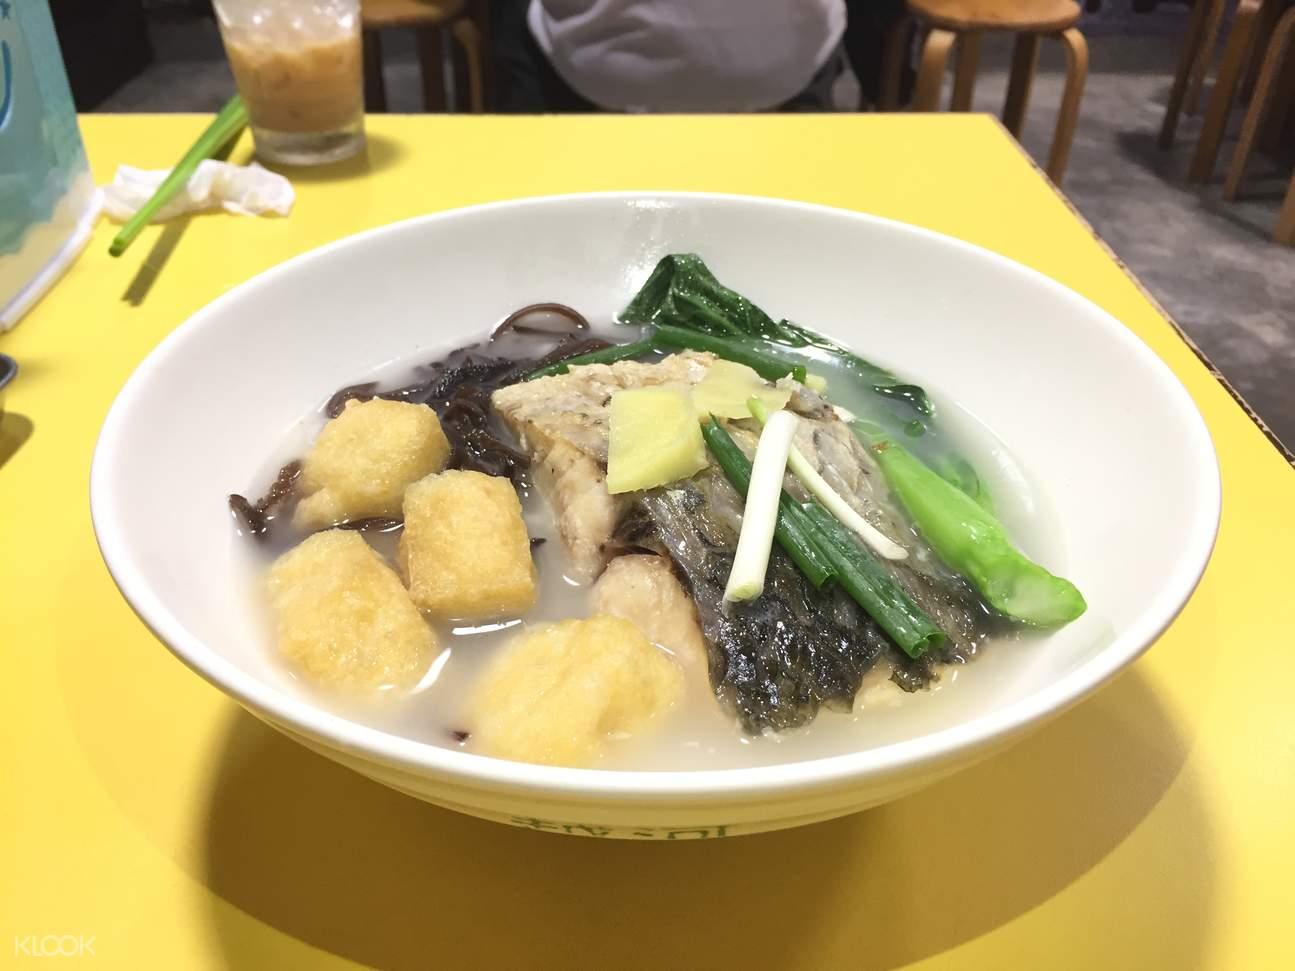 hoi pong chan kee restaurant kennedy town hong kong